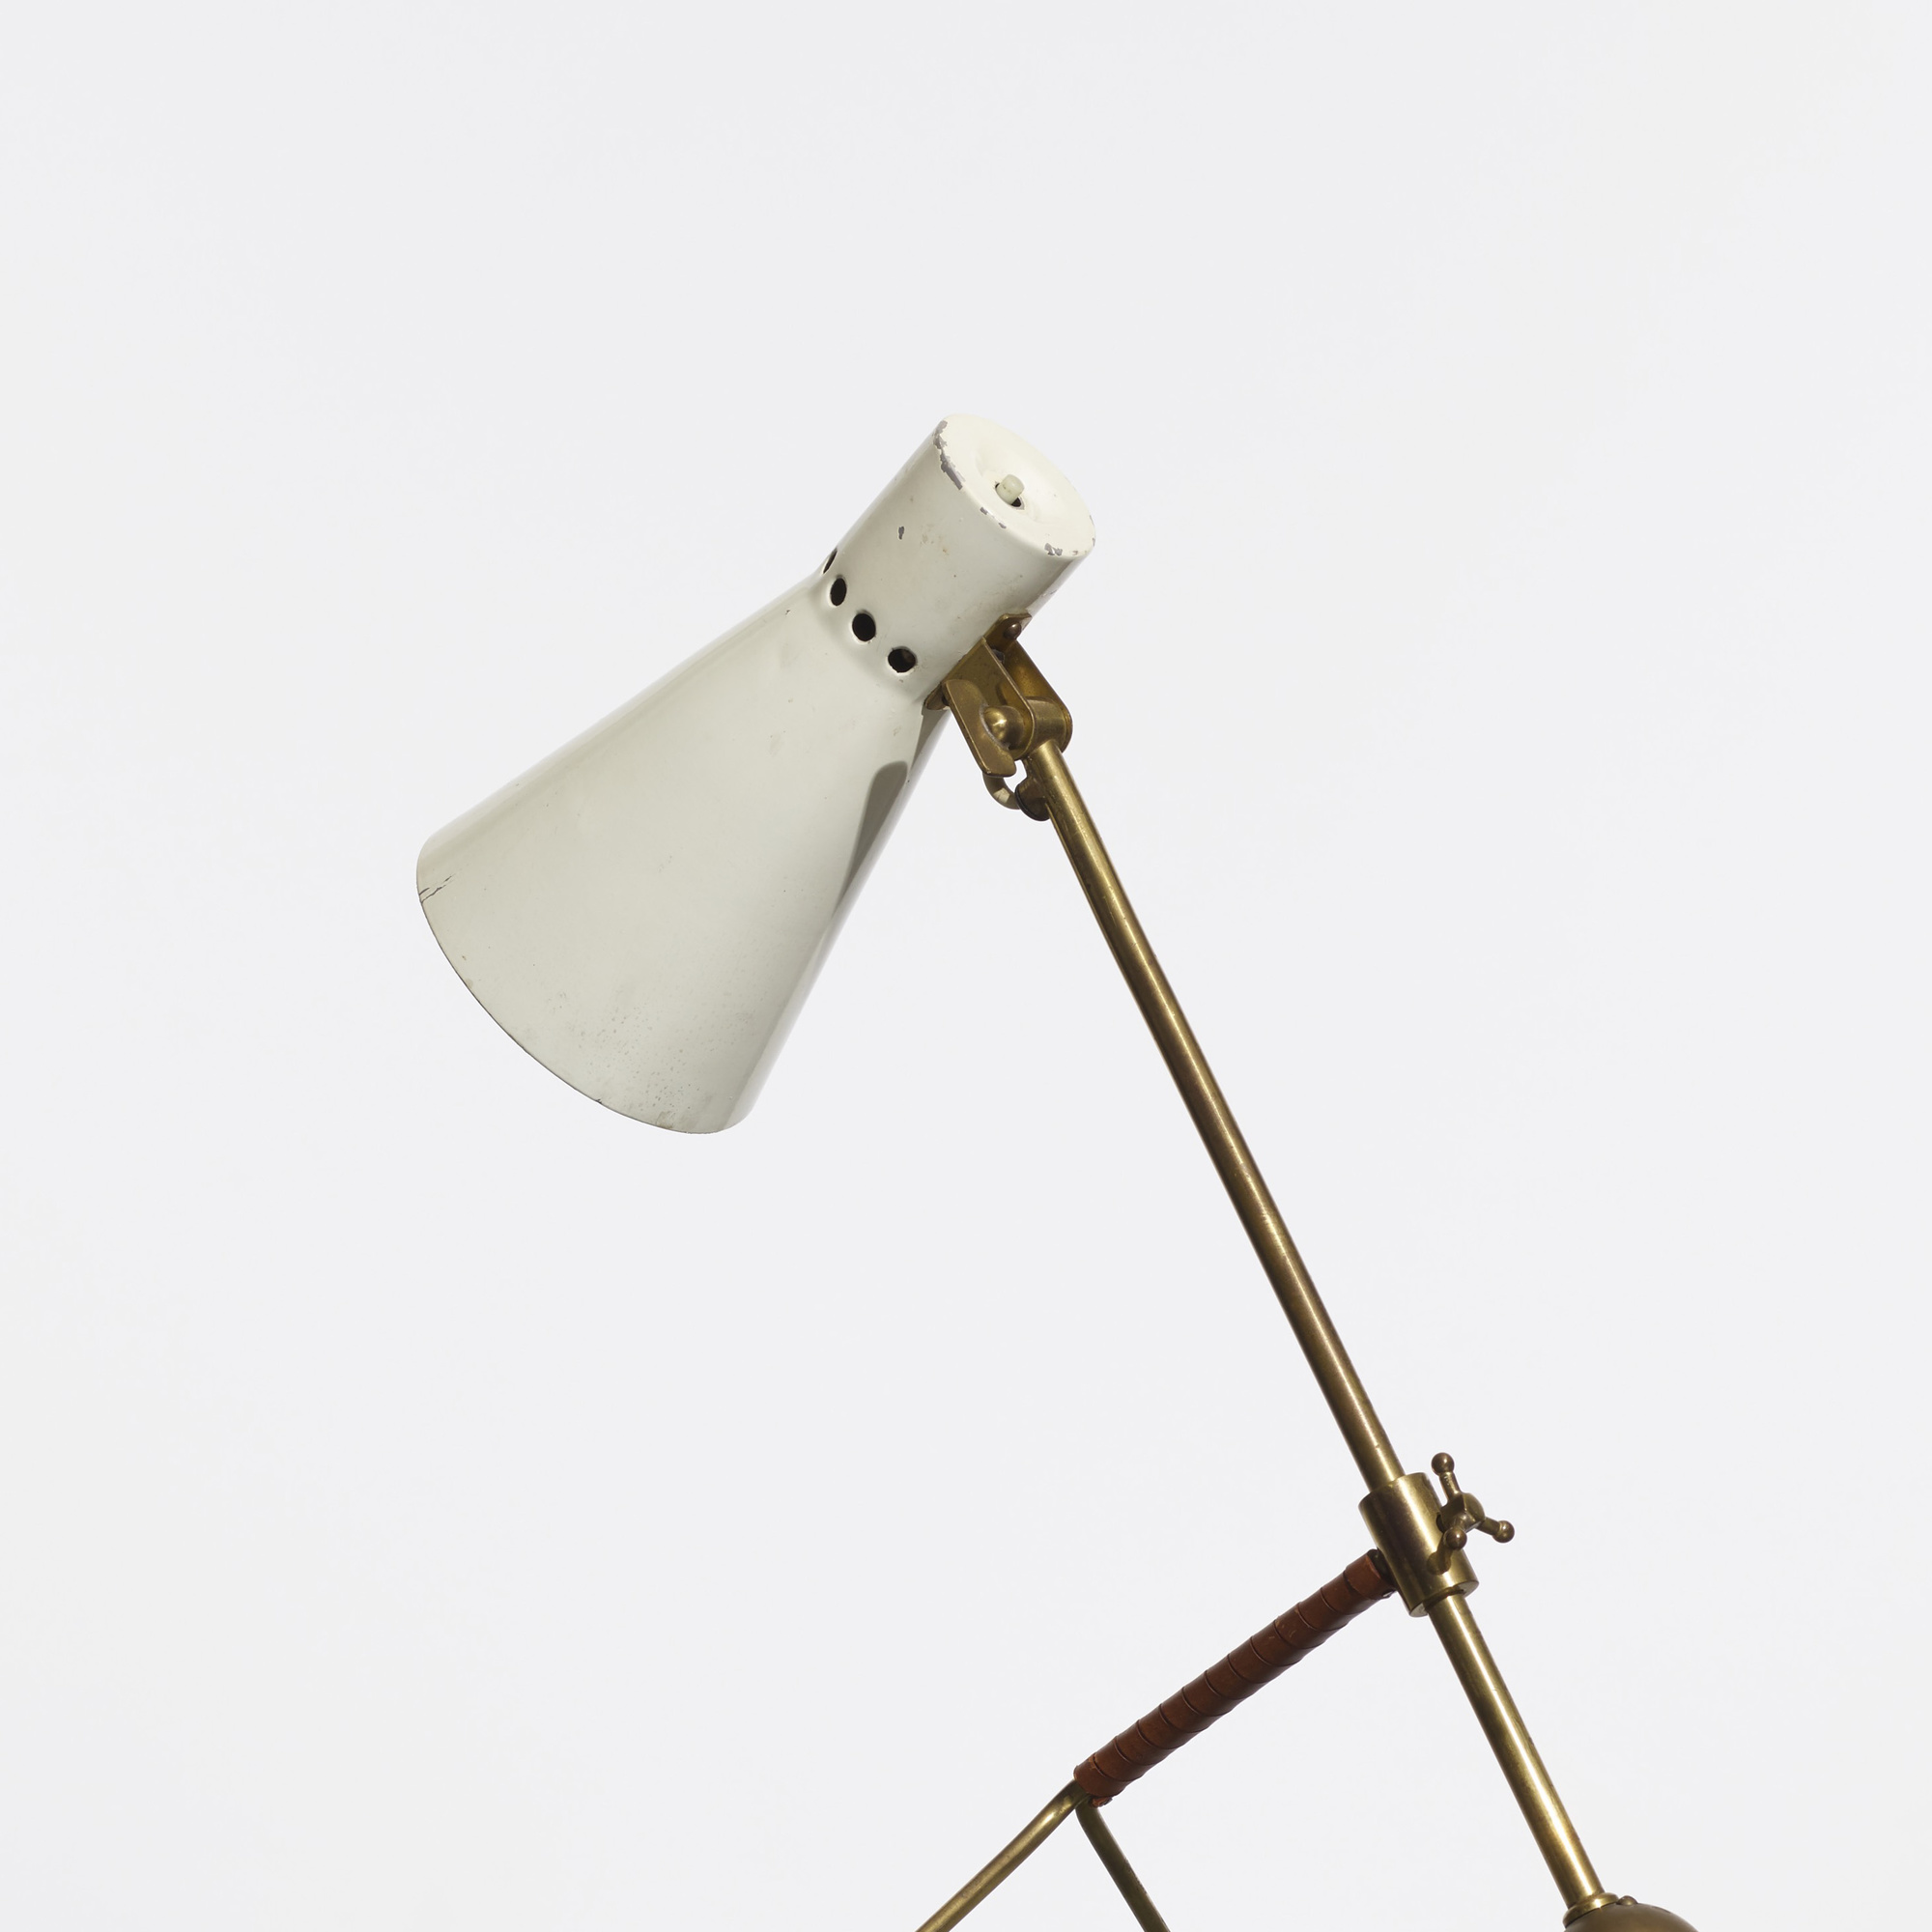 120: Tapio Wirkkala / table lamp, model K11-16 (2 of 2)